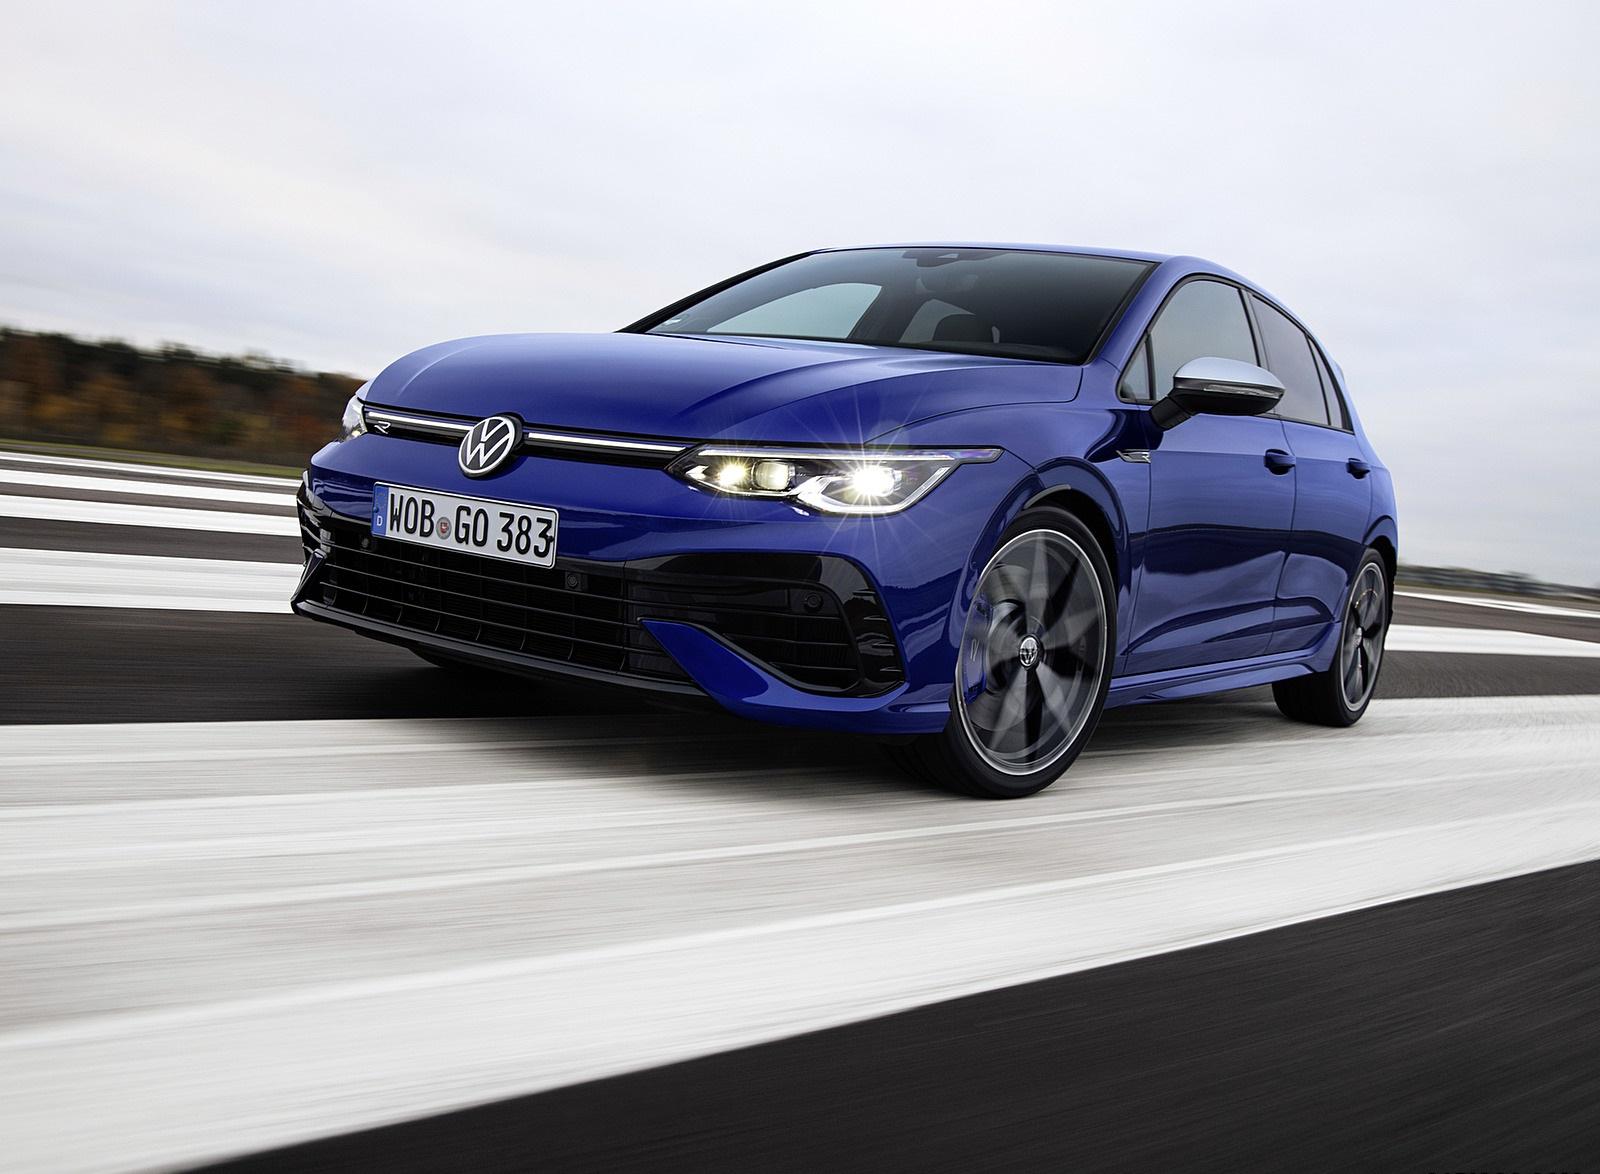 2022 Volkswagen Golf R Front Three-Quarter Wallpapers (1)